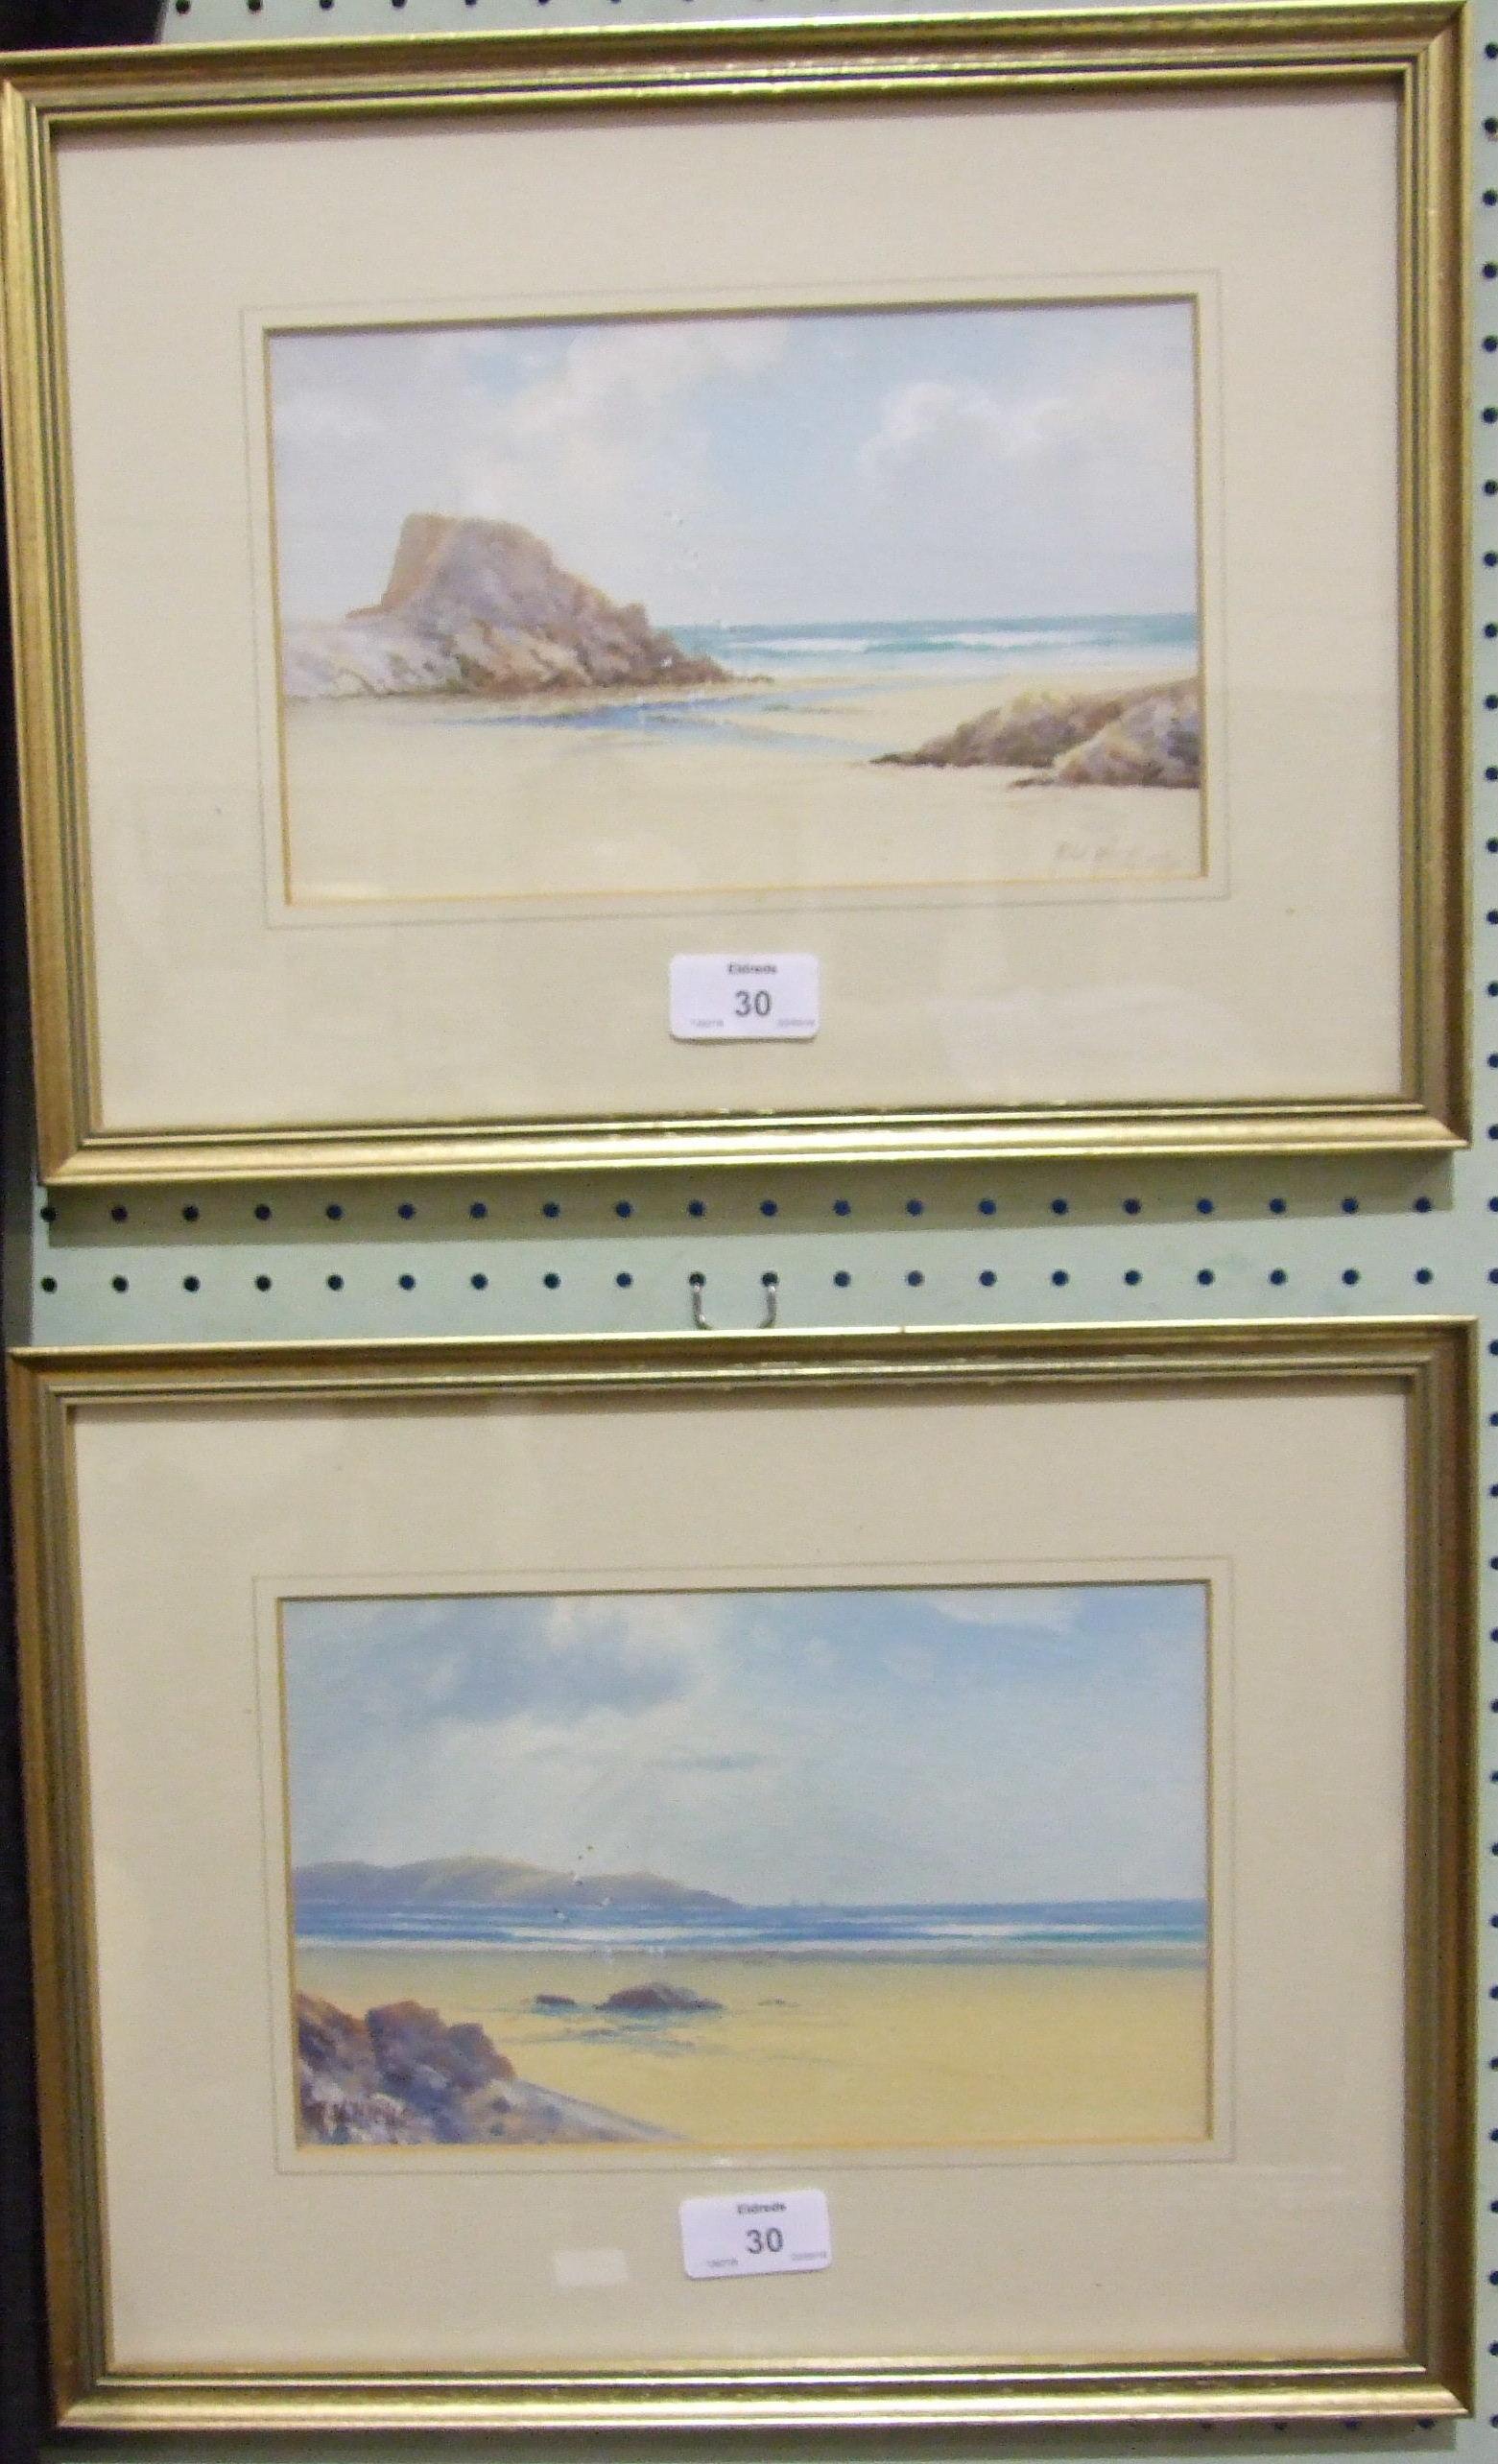 Herbert William Hicks (1880-1944) THE BREAKWATER, BUDE Signed watercolour heightened with white,